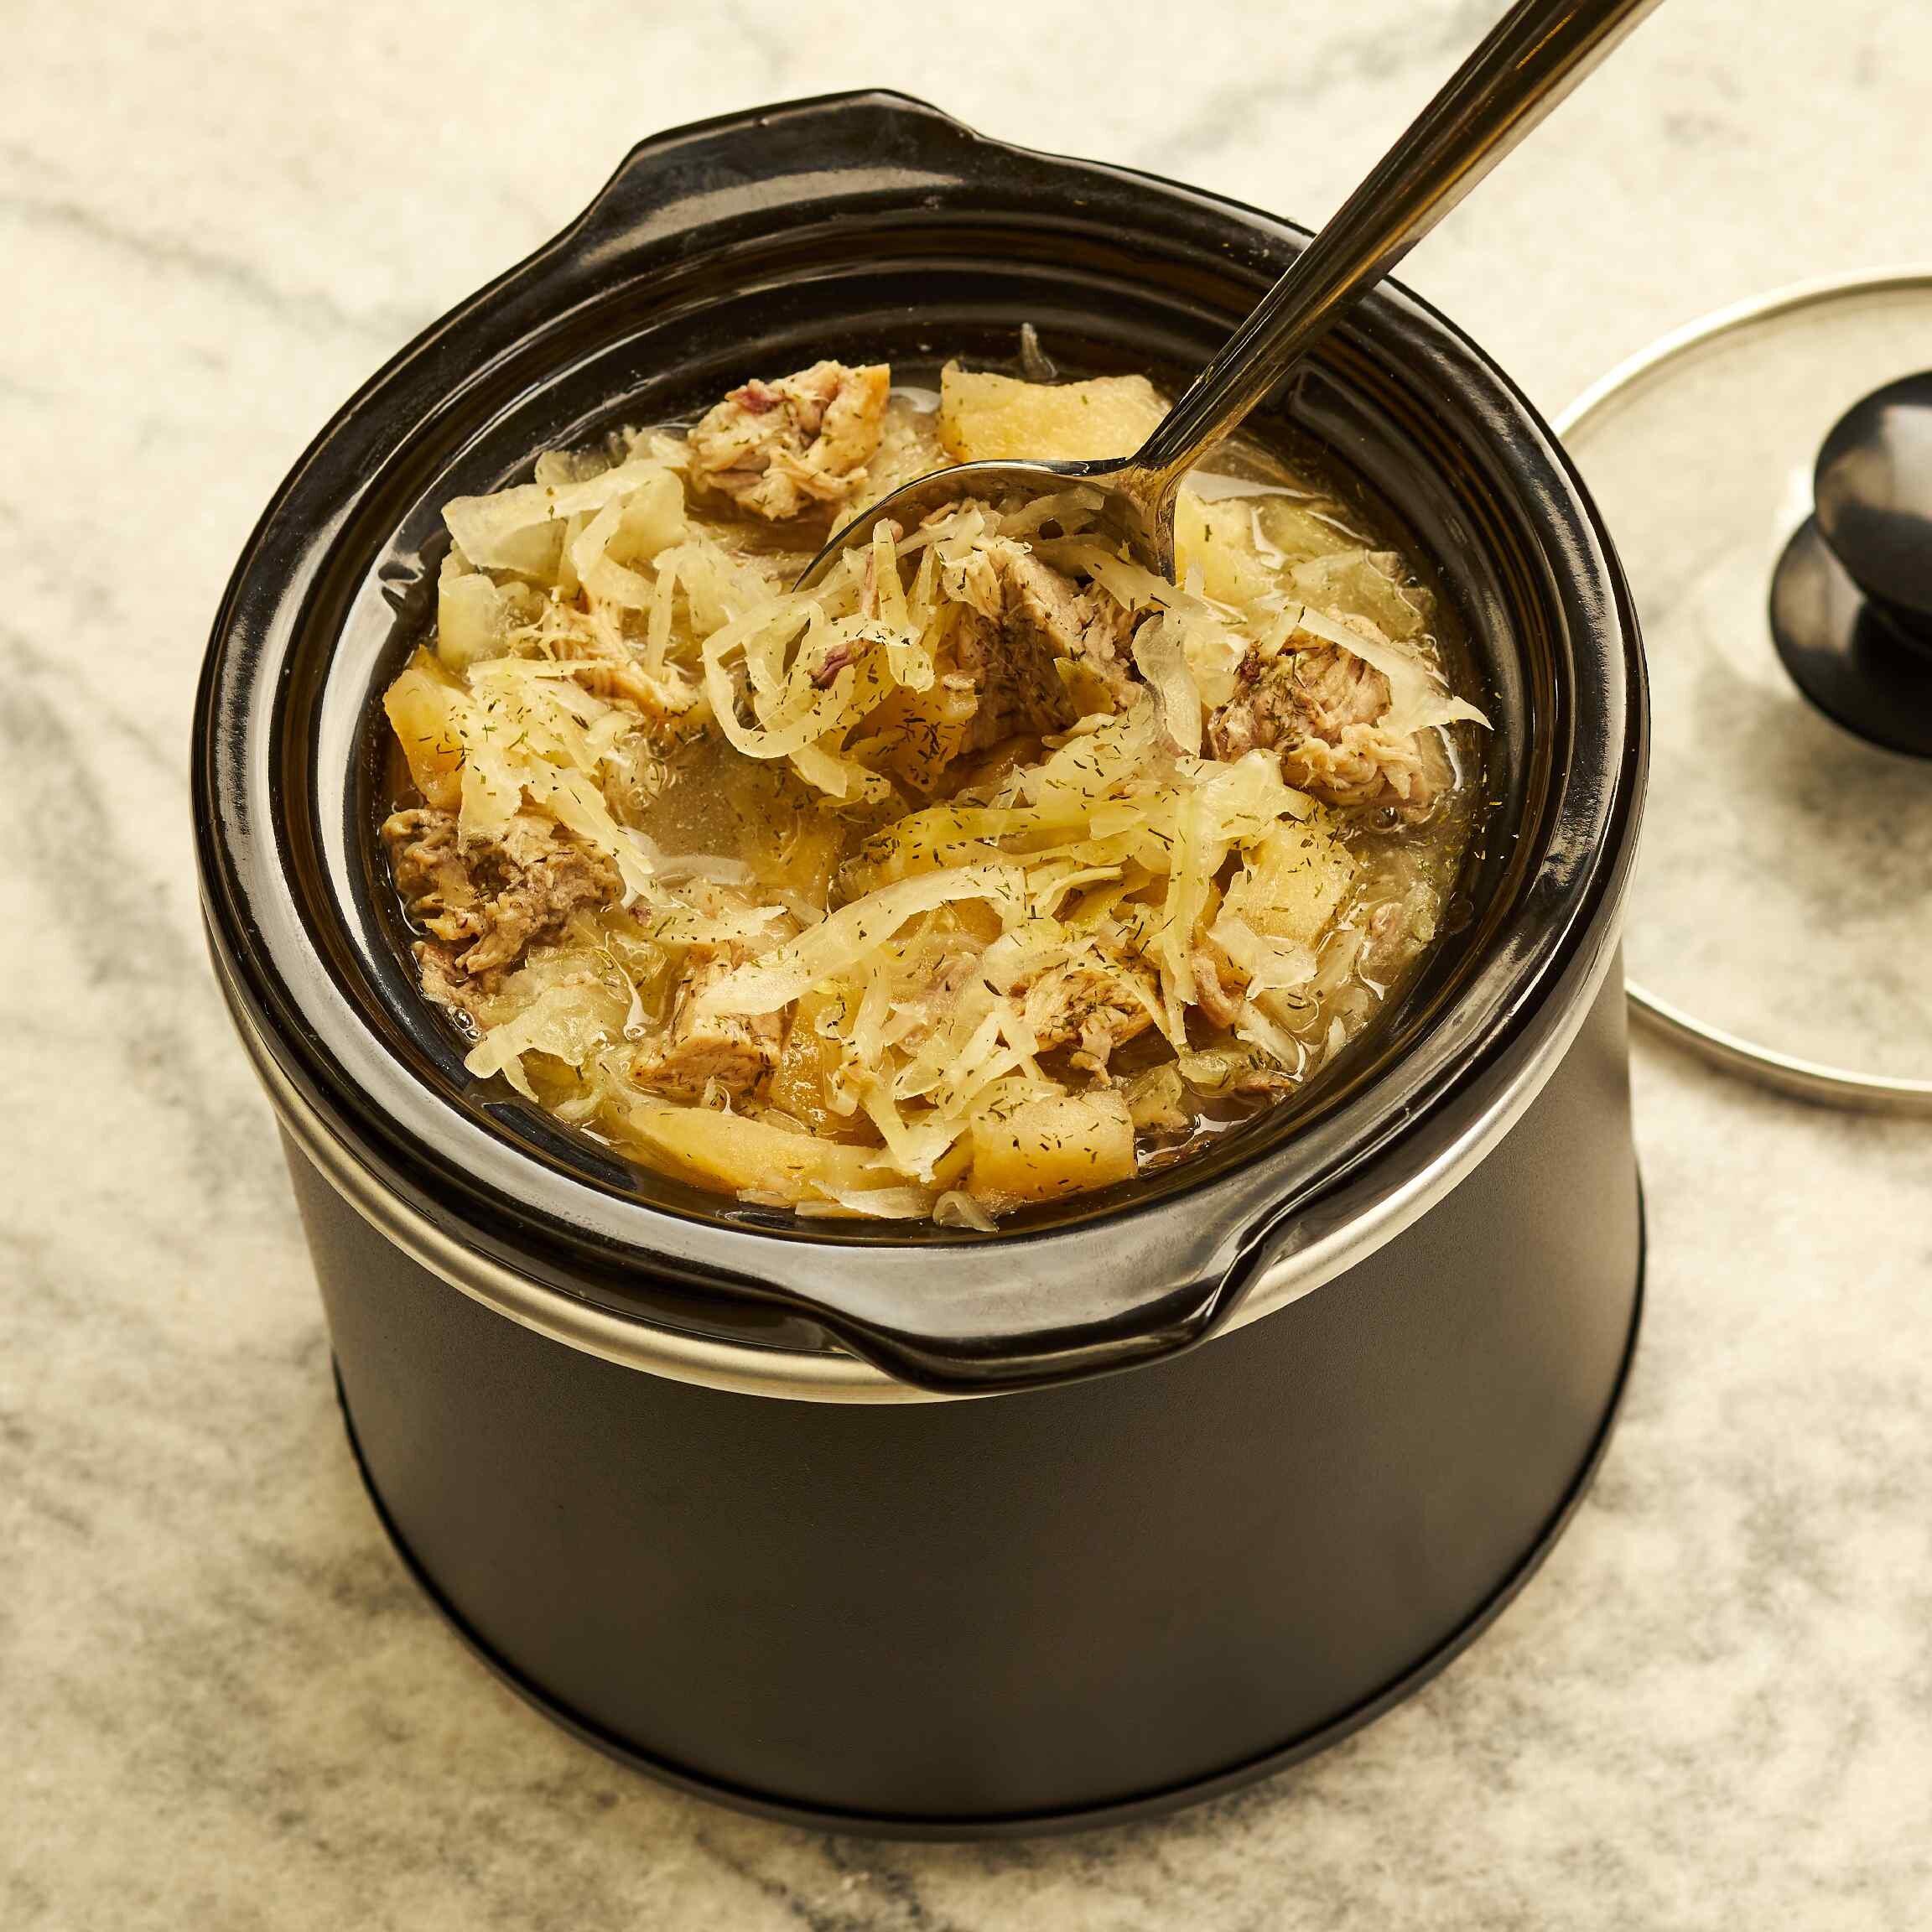 easy pork and sauerkraut recipe